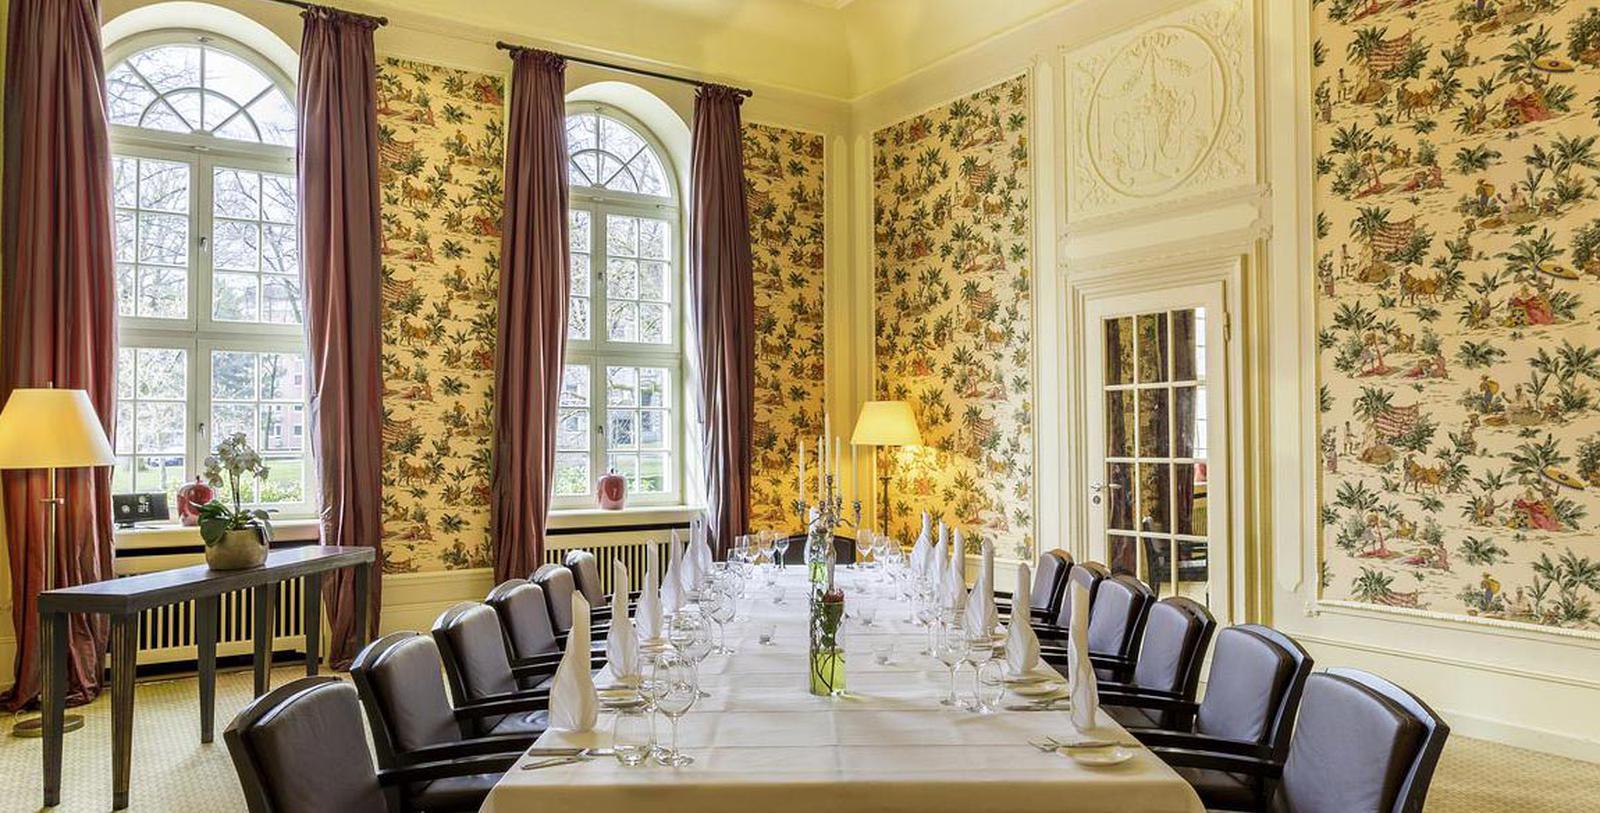 Image of Boardroom, Hotel Pullman Aachen Quellenhof, Aachen, Germany, 1916, Member of Historic Hotels Worldwide, Experience